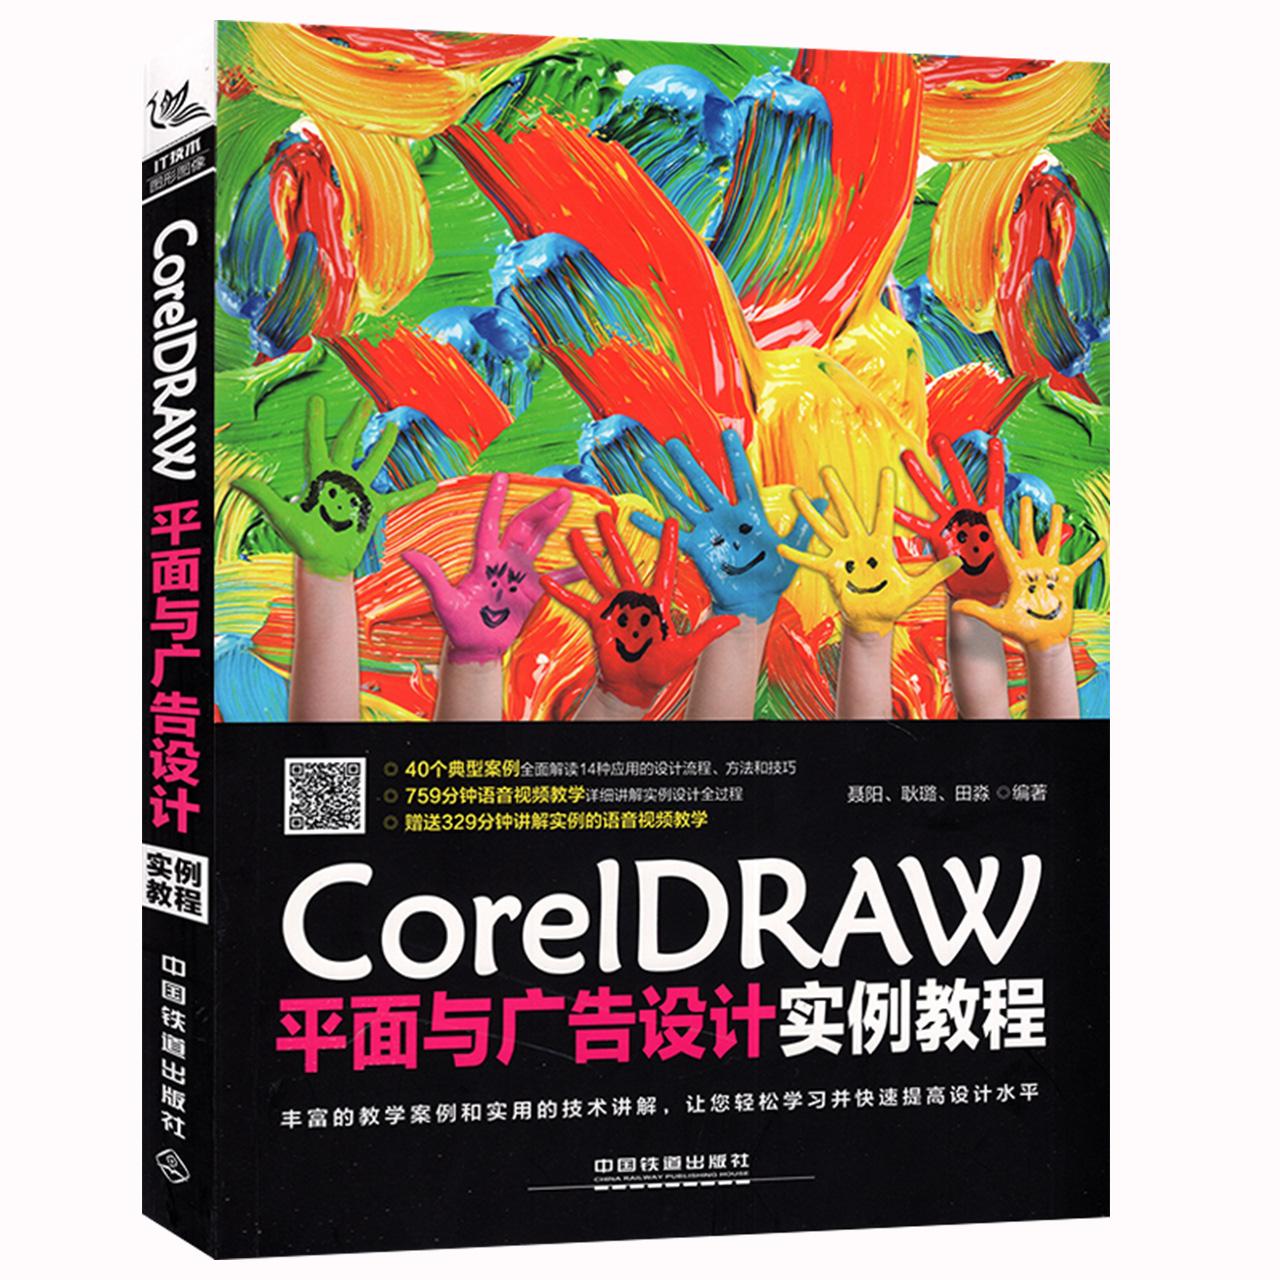 CorelDRAW平面与广告设计实例教程 CDR软件视频教程书籍 CDR平面广告设计应用 花纹海报底片宣传单画册杂志商业插画设计制作素材书